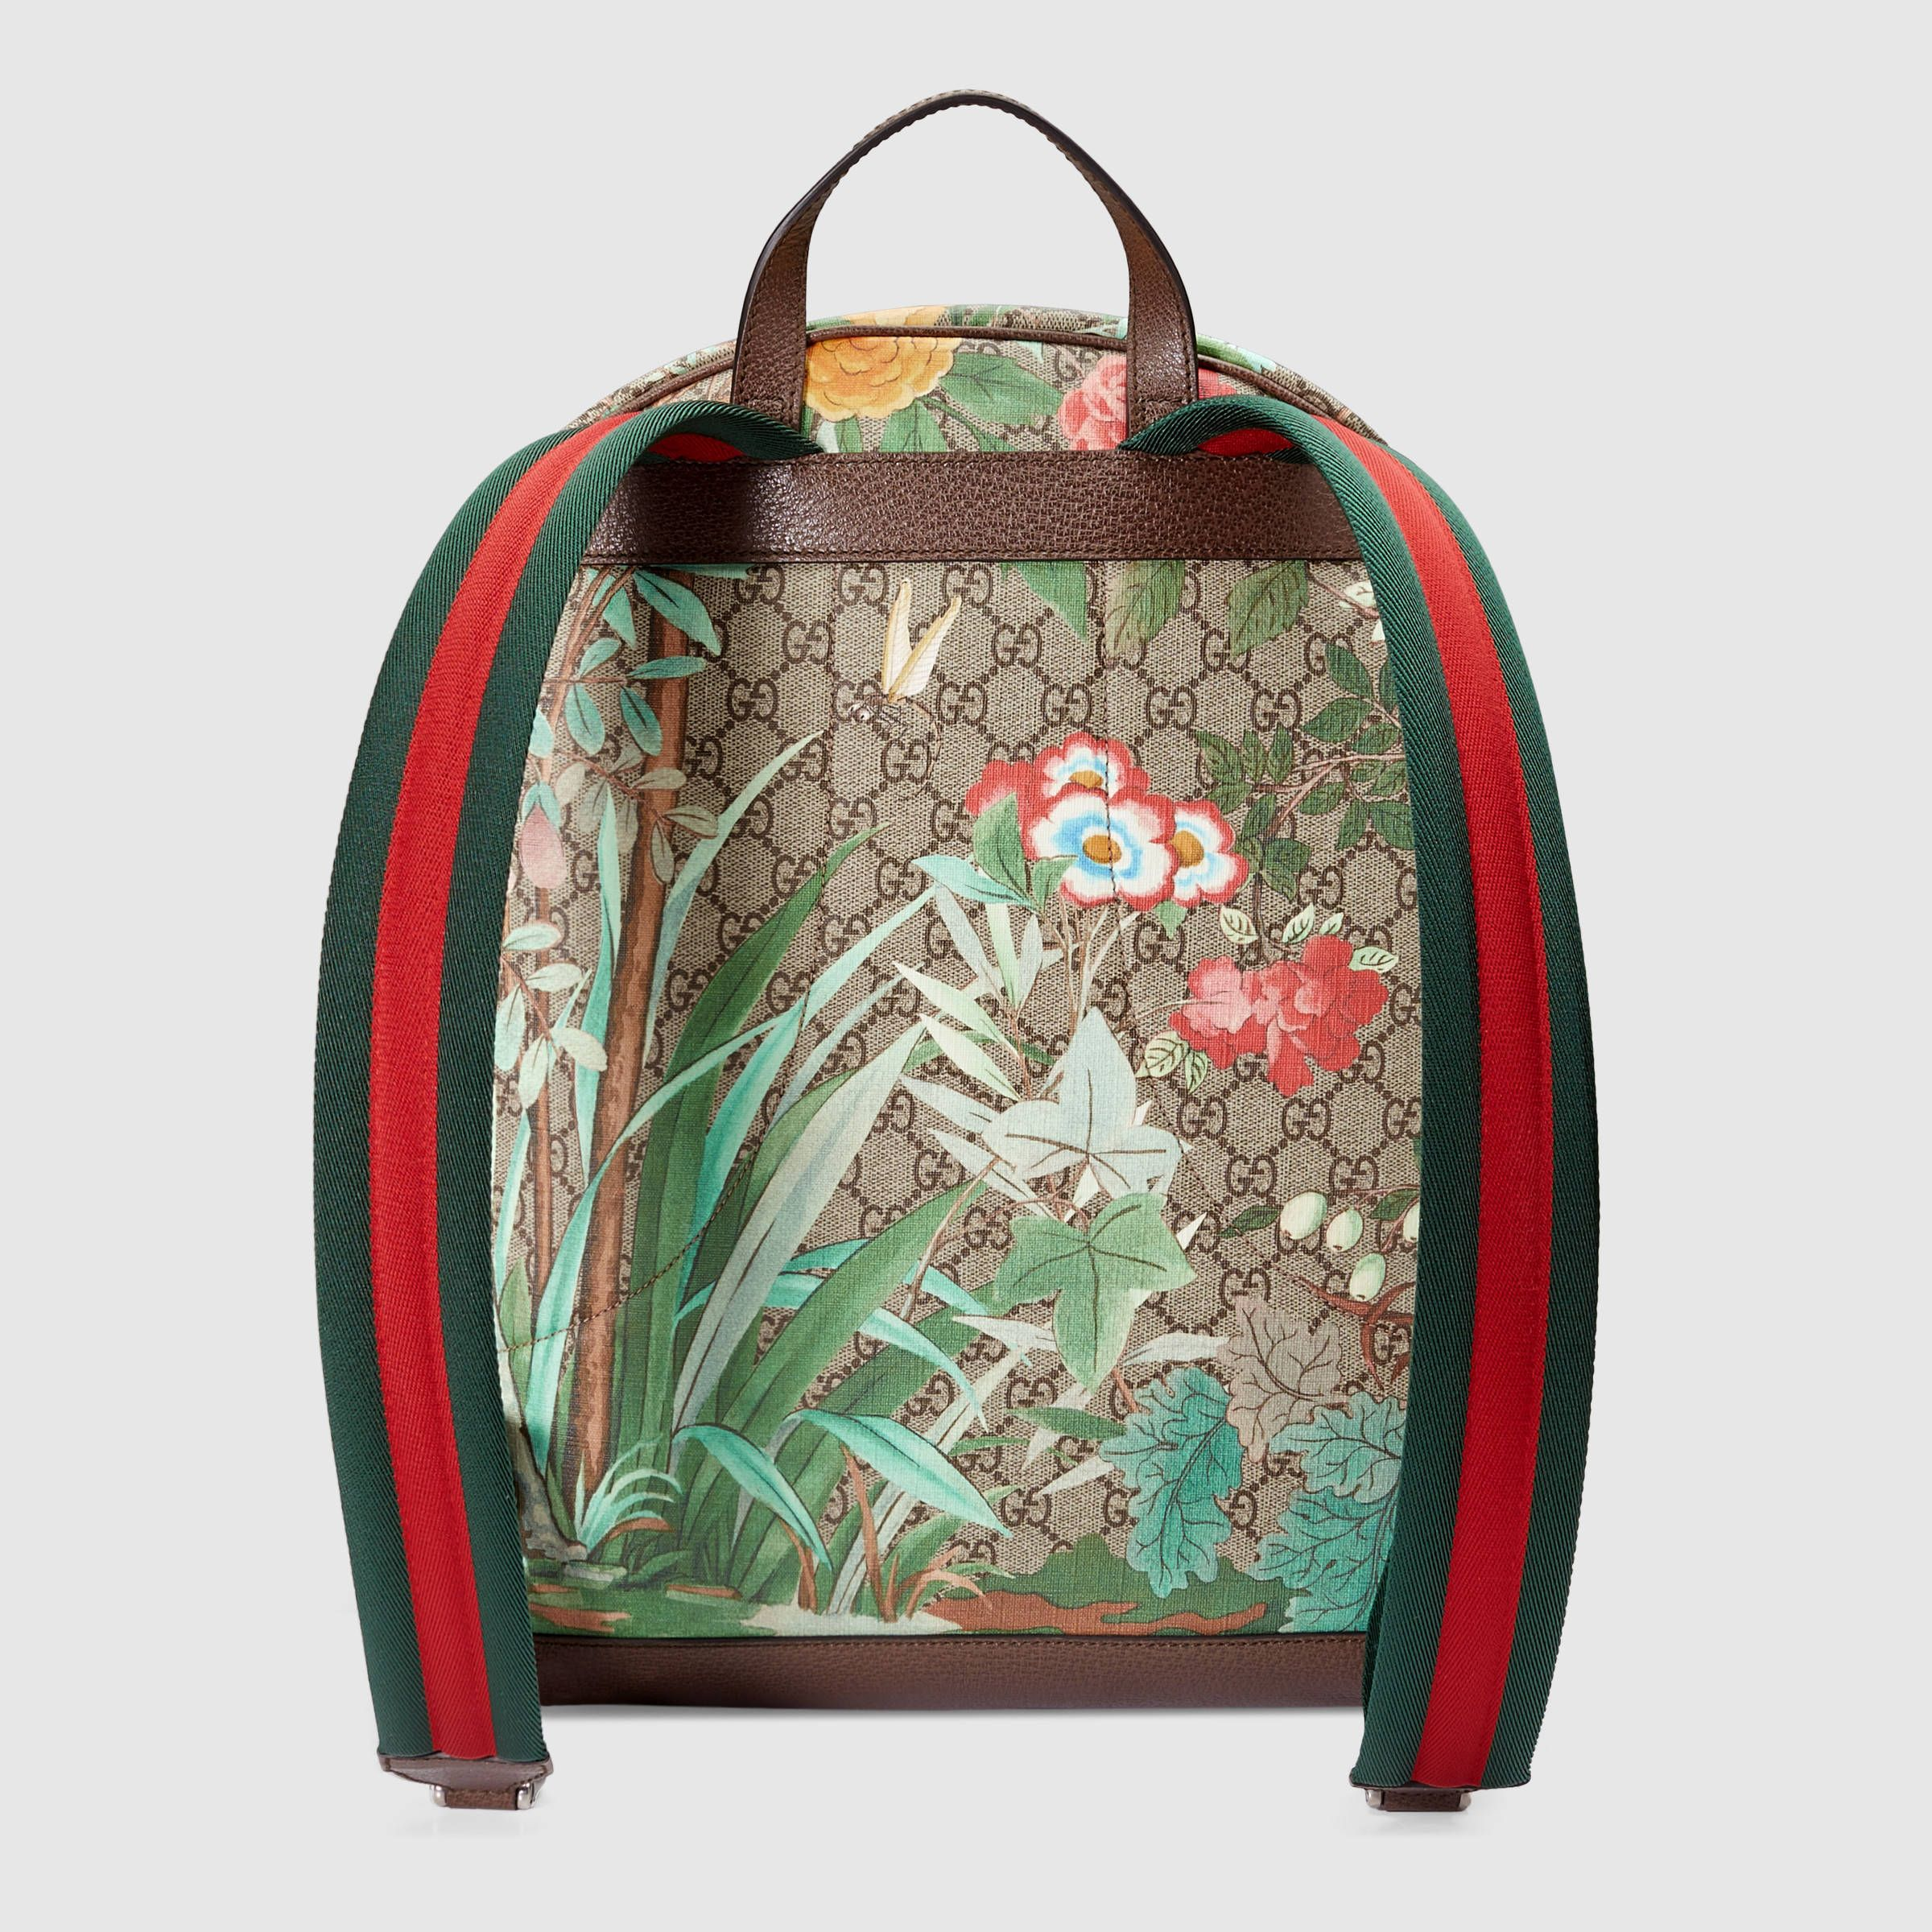 31f4fbed970cc2 Gucci Men - Gucci Tian GG Supreme backpack - 428027K0LCN8685 ...